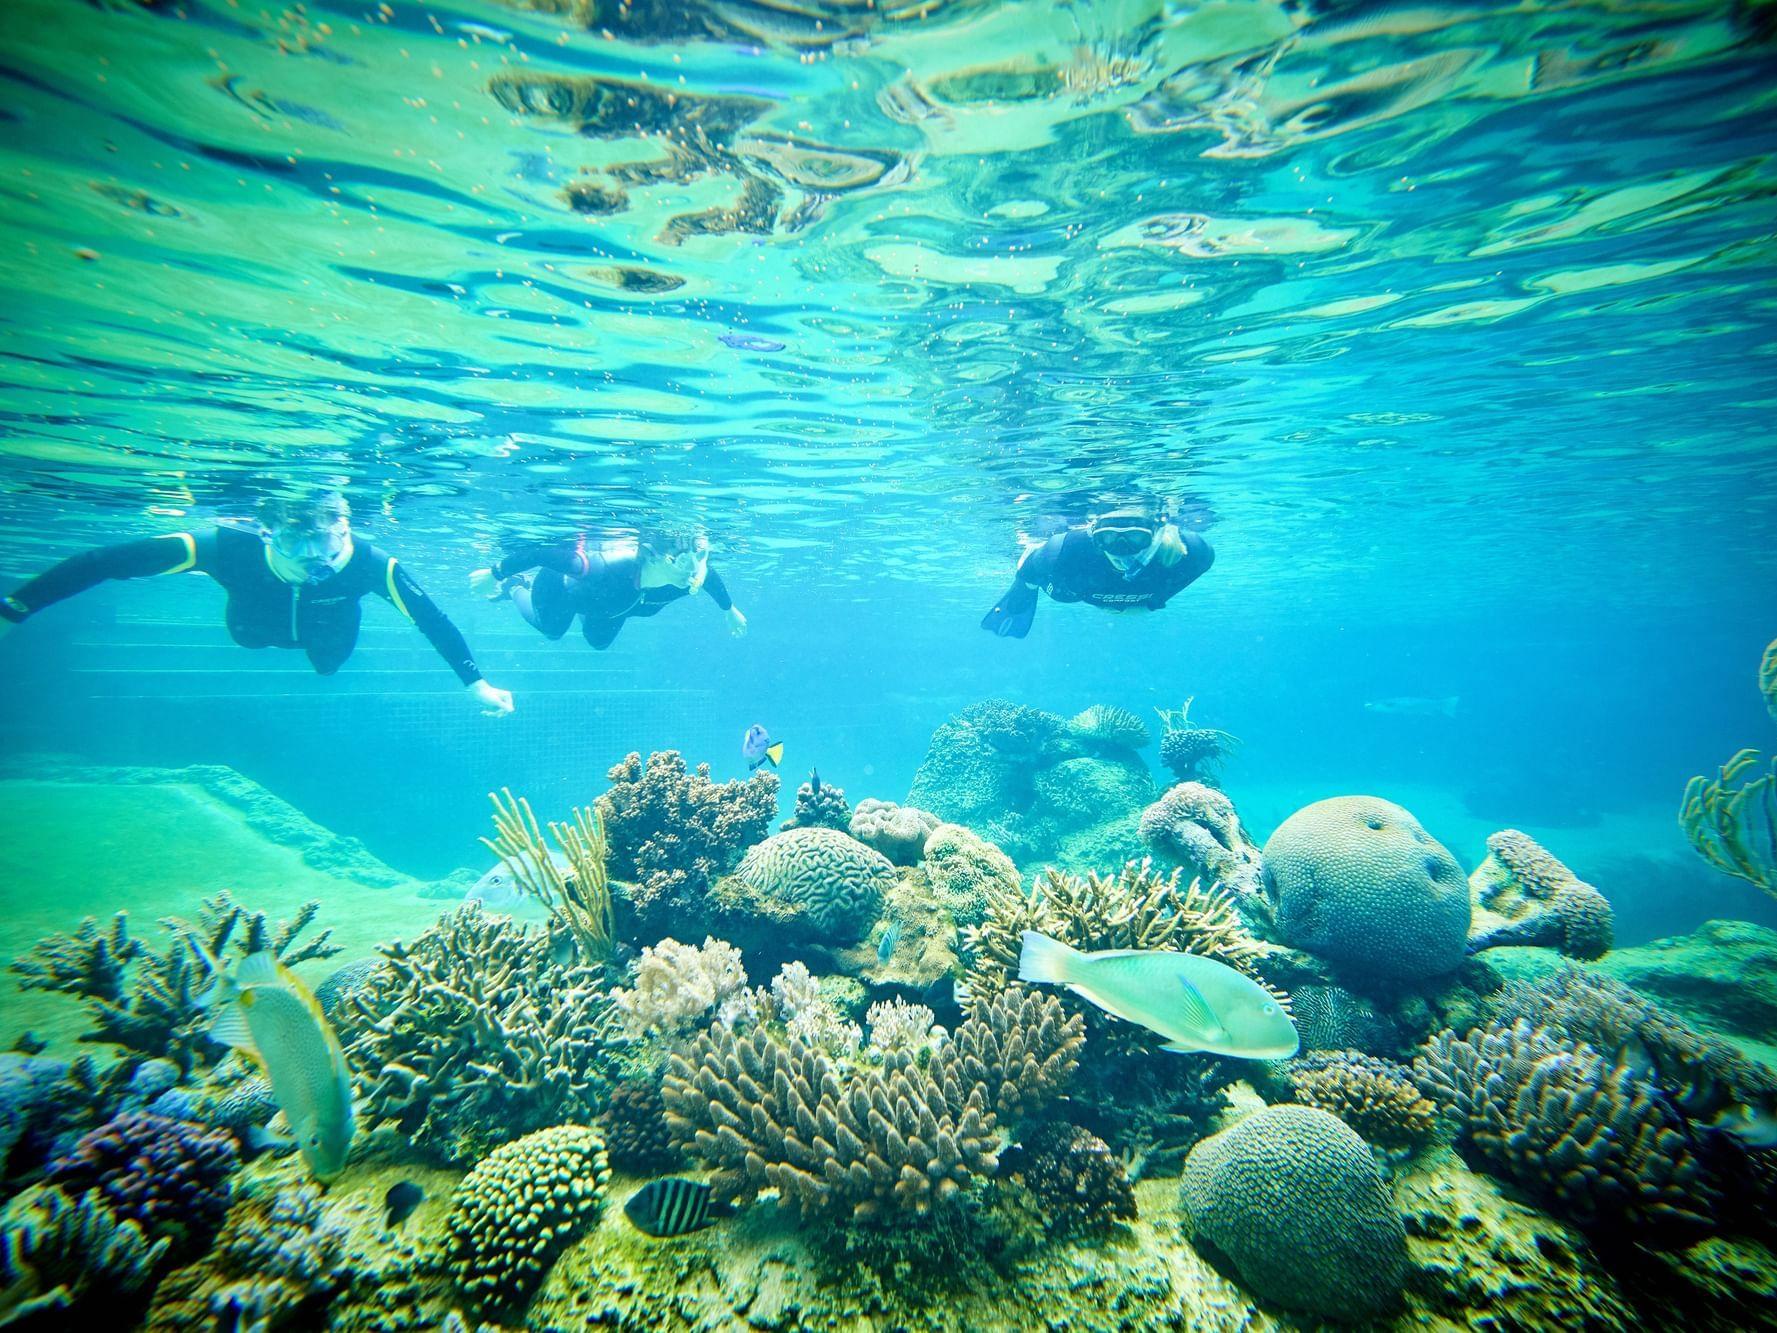 Guests snorkeling in deep sea near Daydream Island Resort